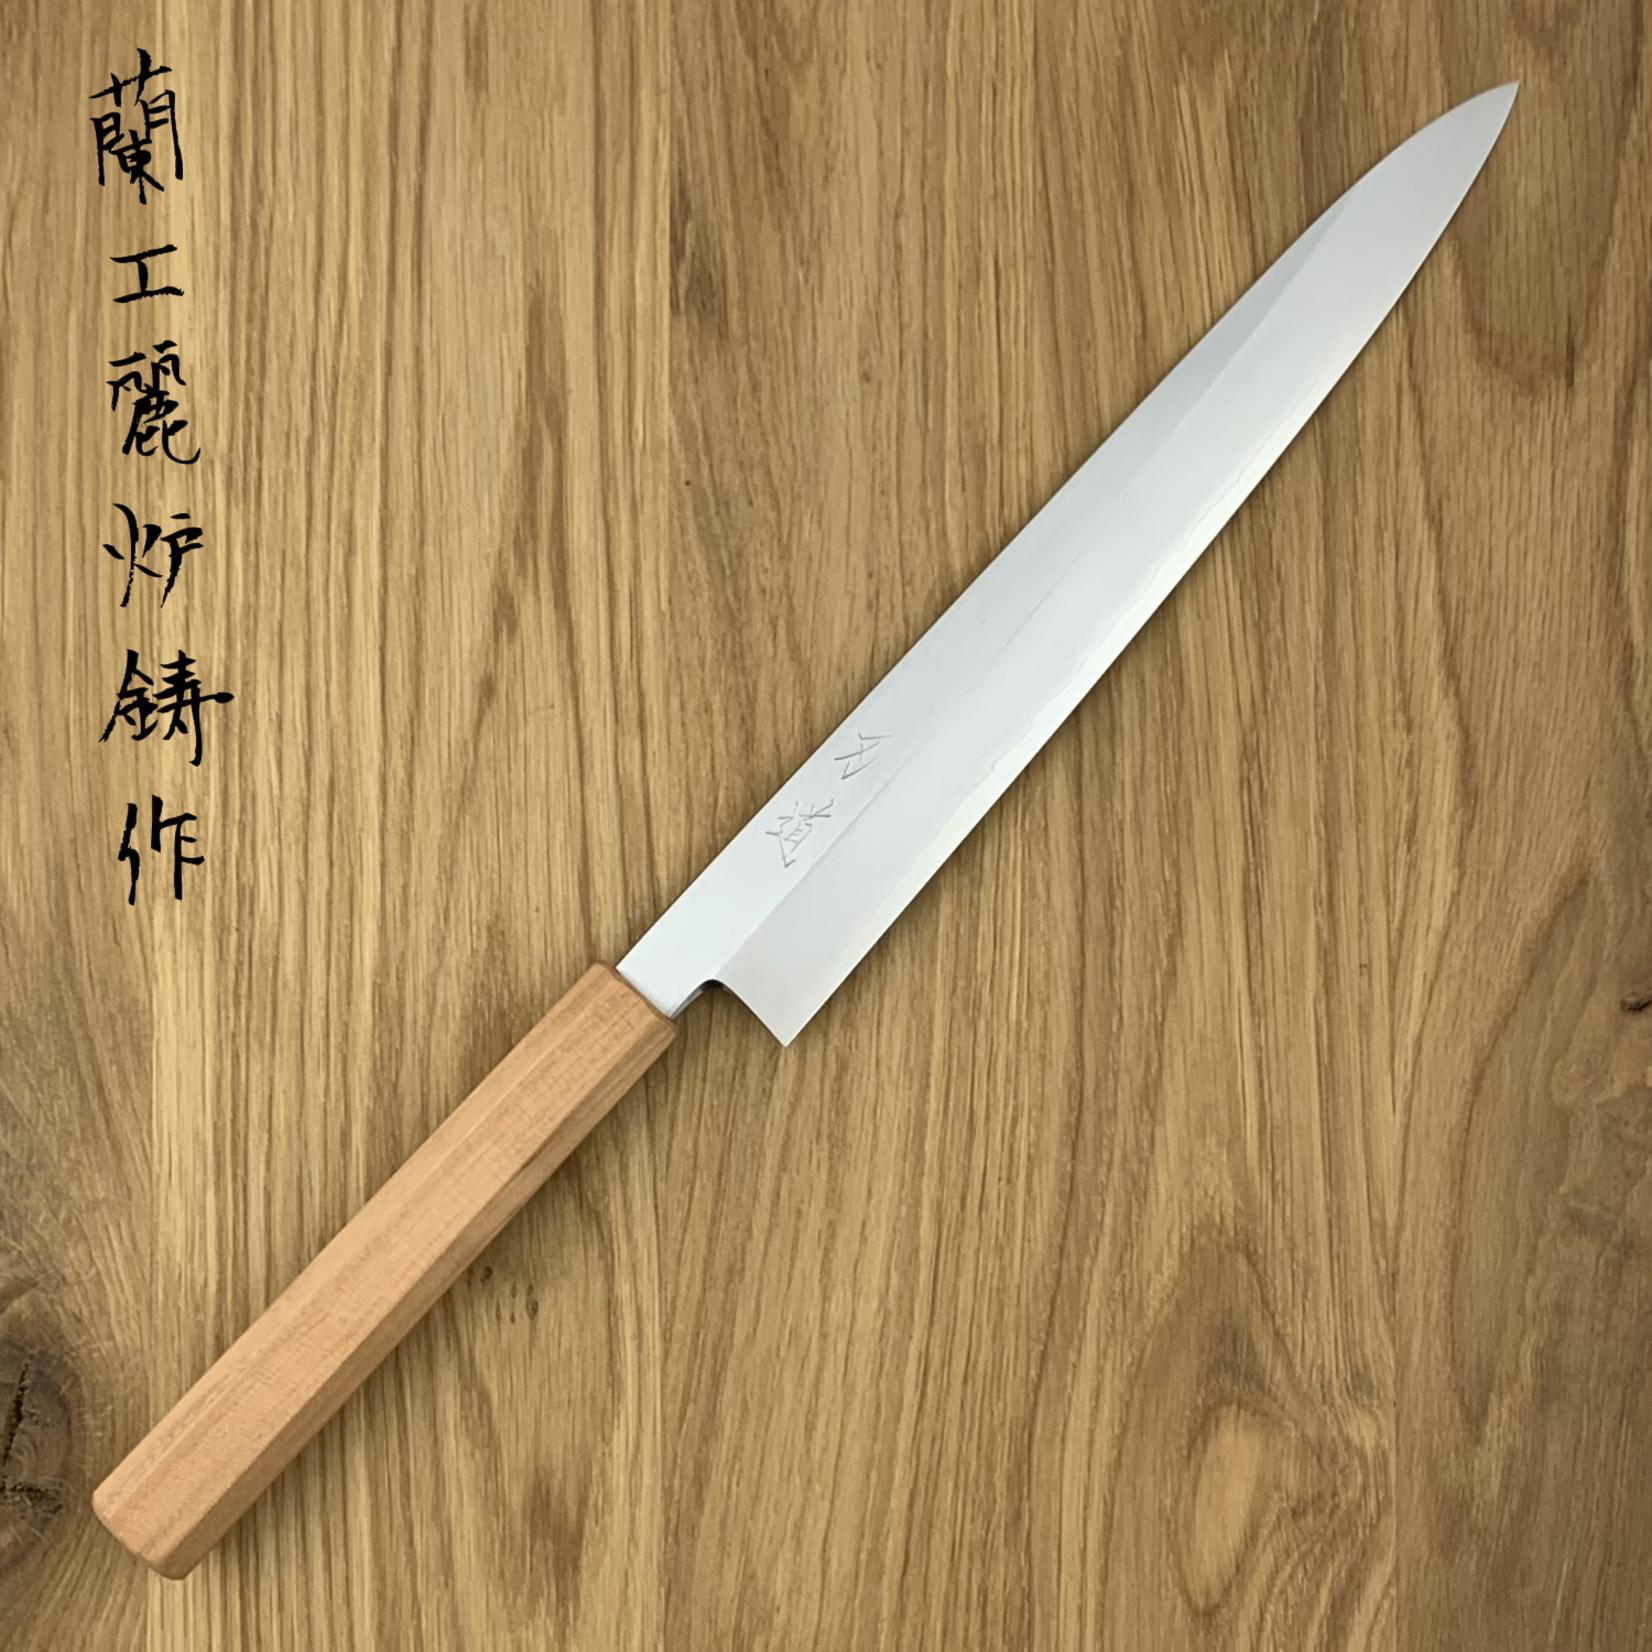 HADO Ginsan Sujihiki 240 mm #72